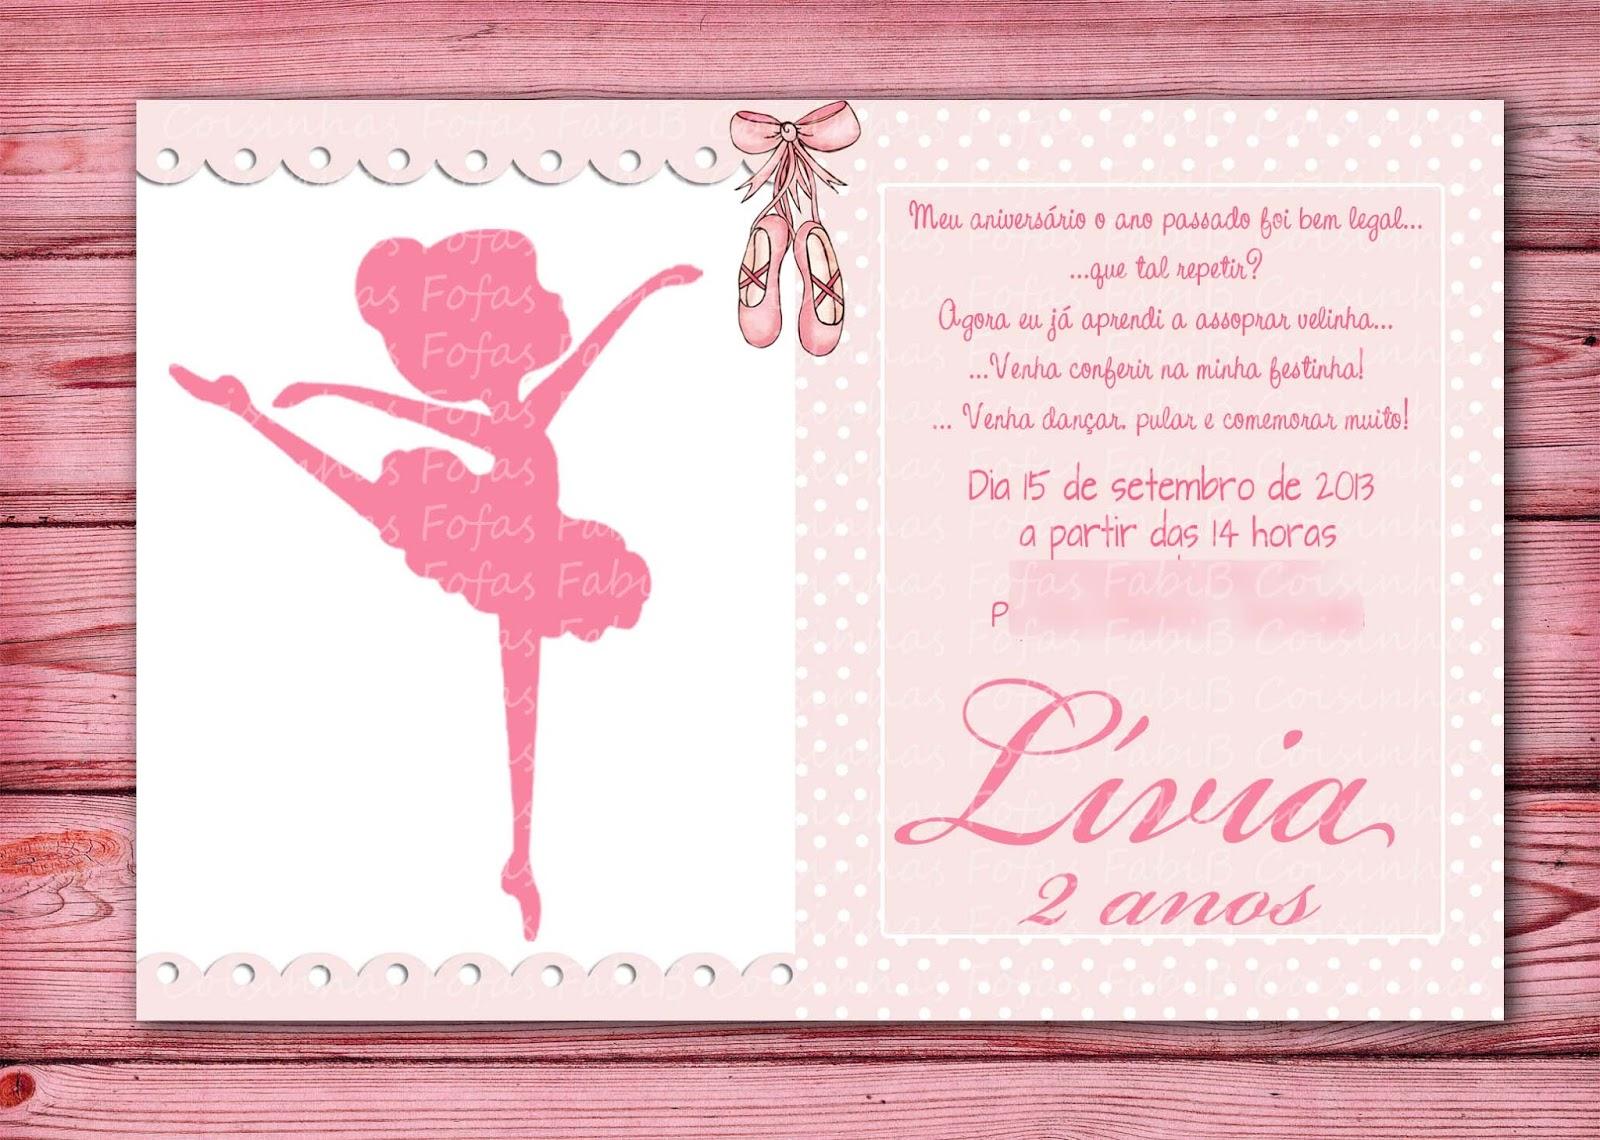 Fabib Convite Bailarina